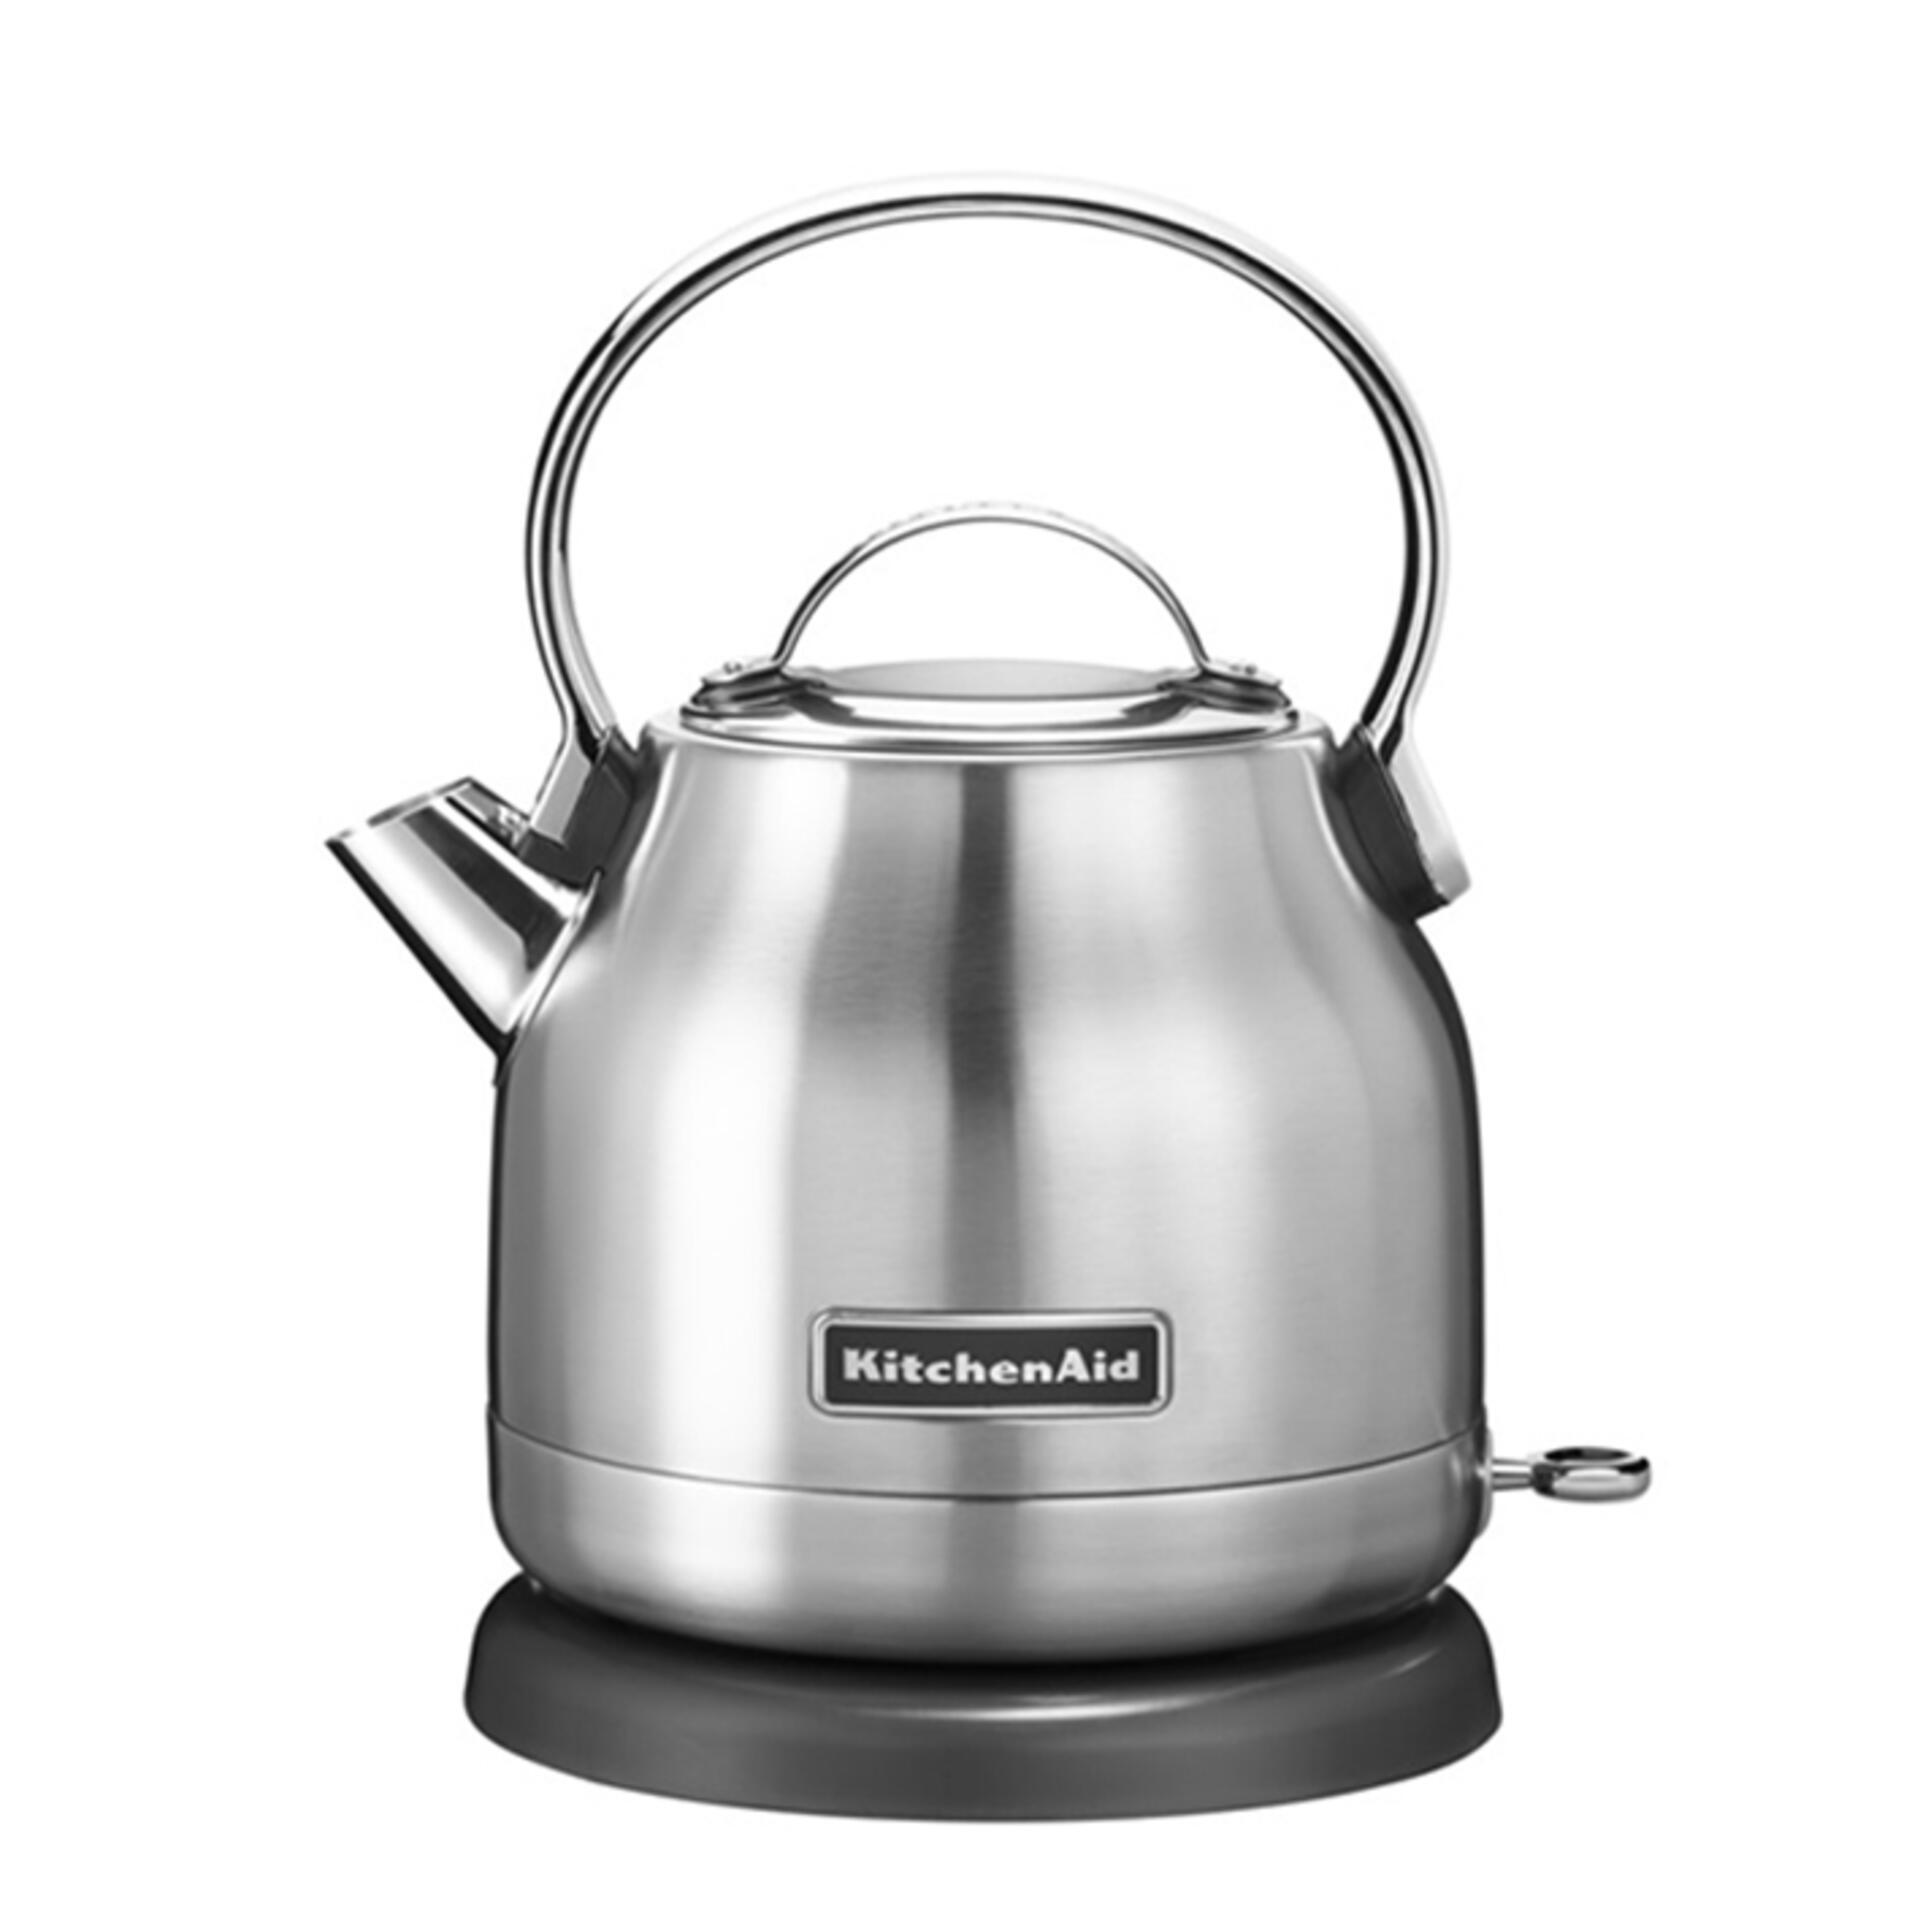 KitchenAid Classic Wasserkocher Edelstahl 5KEK1222ESX